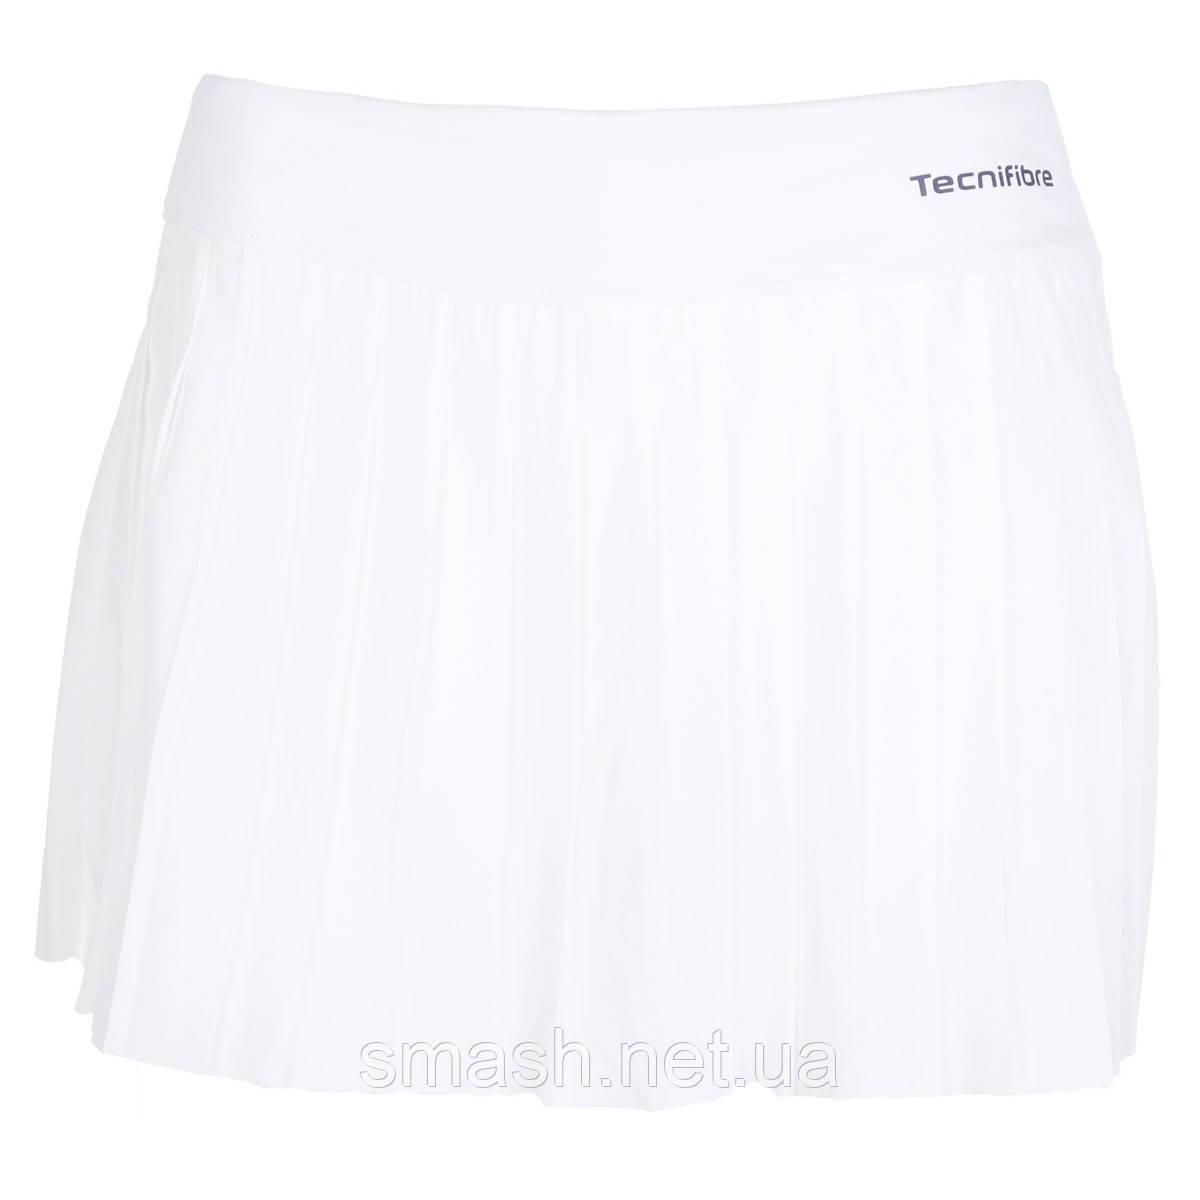 Юбка для Девочек Tecnifibre Girls Skirt